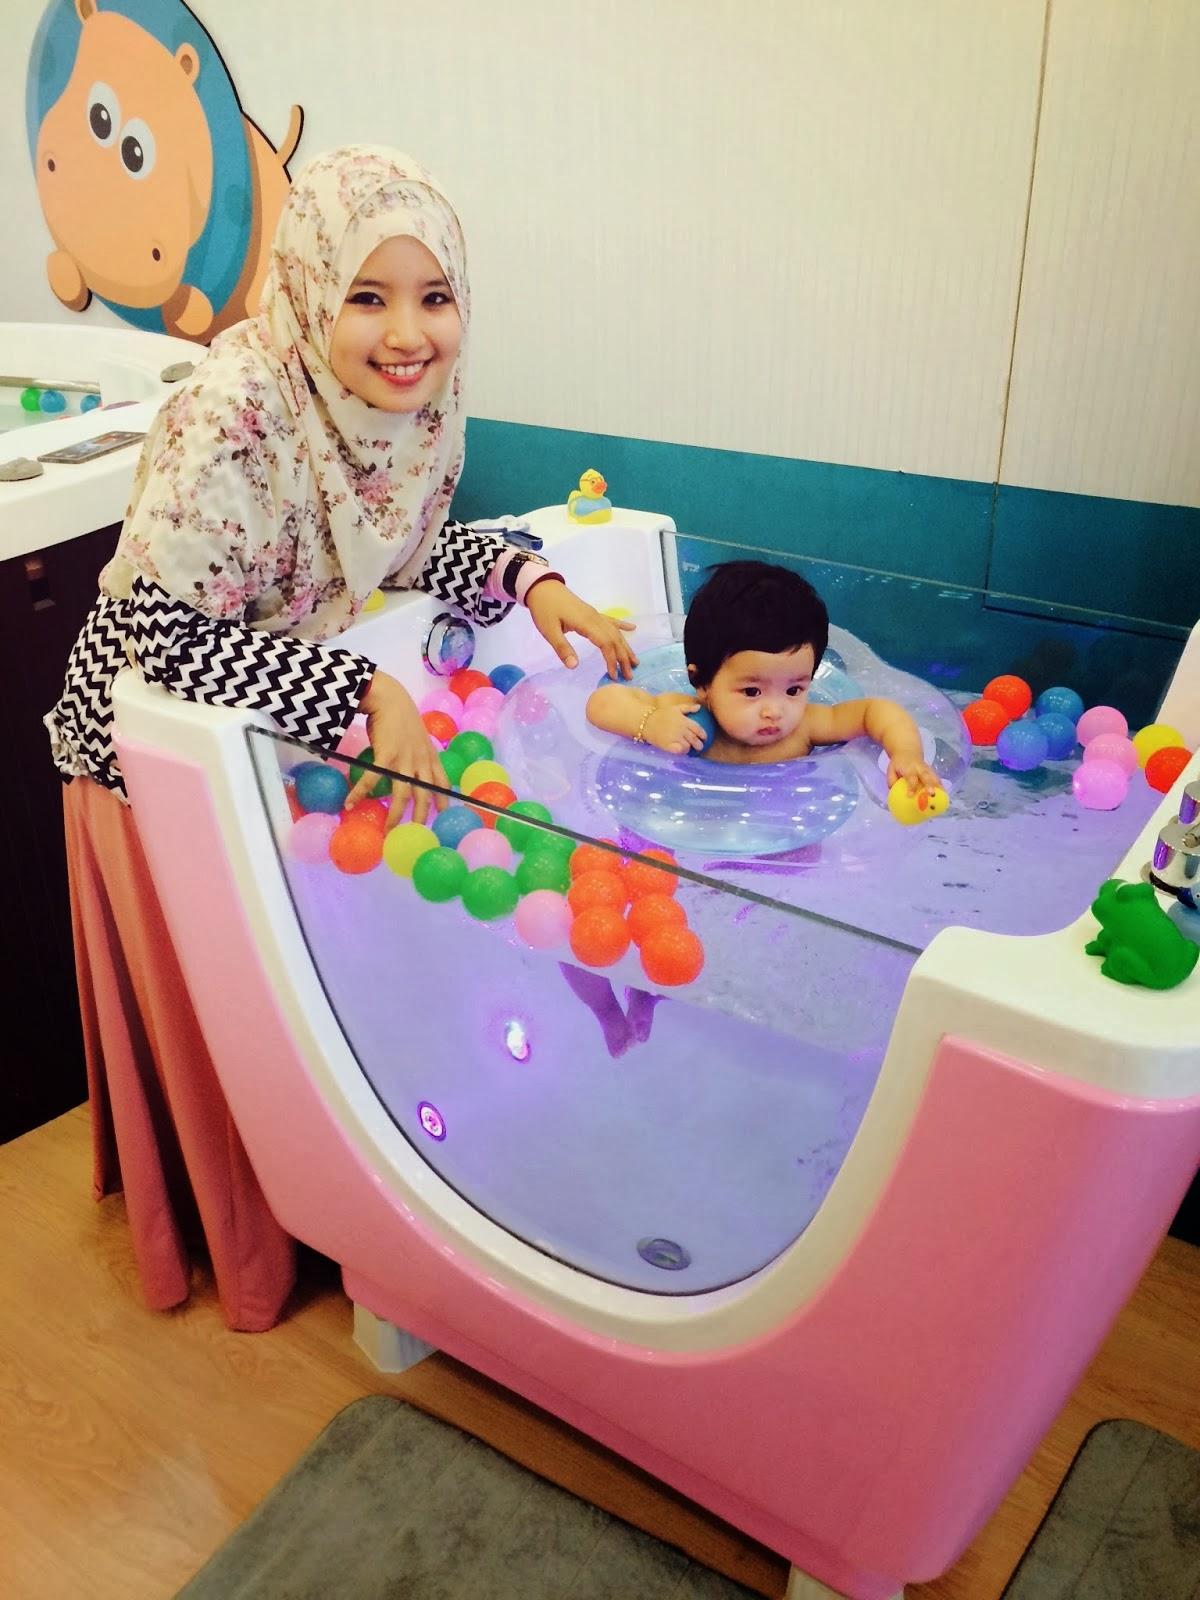 Spa Pool Jual Baby Intime Bath Tub Bak Mandi Bayi Pictures